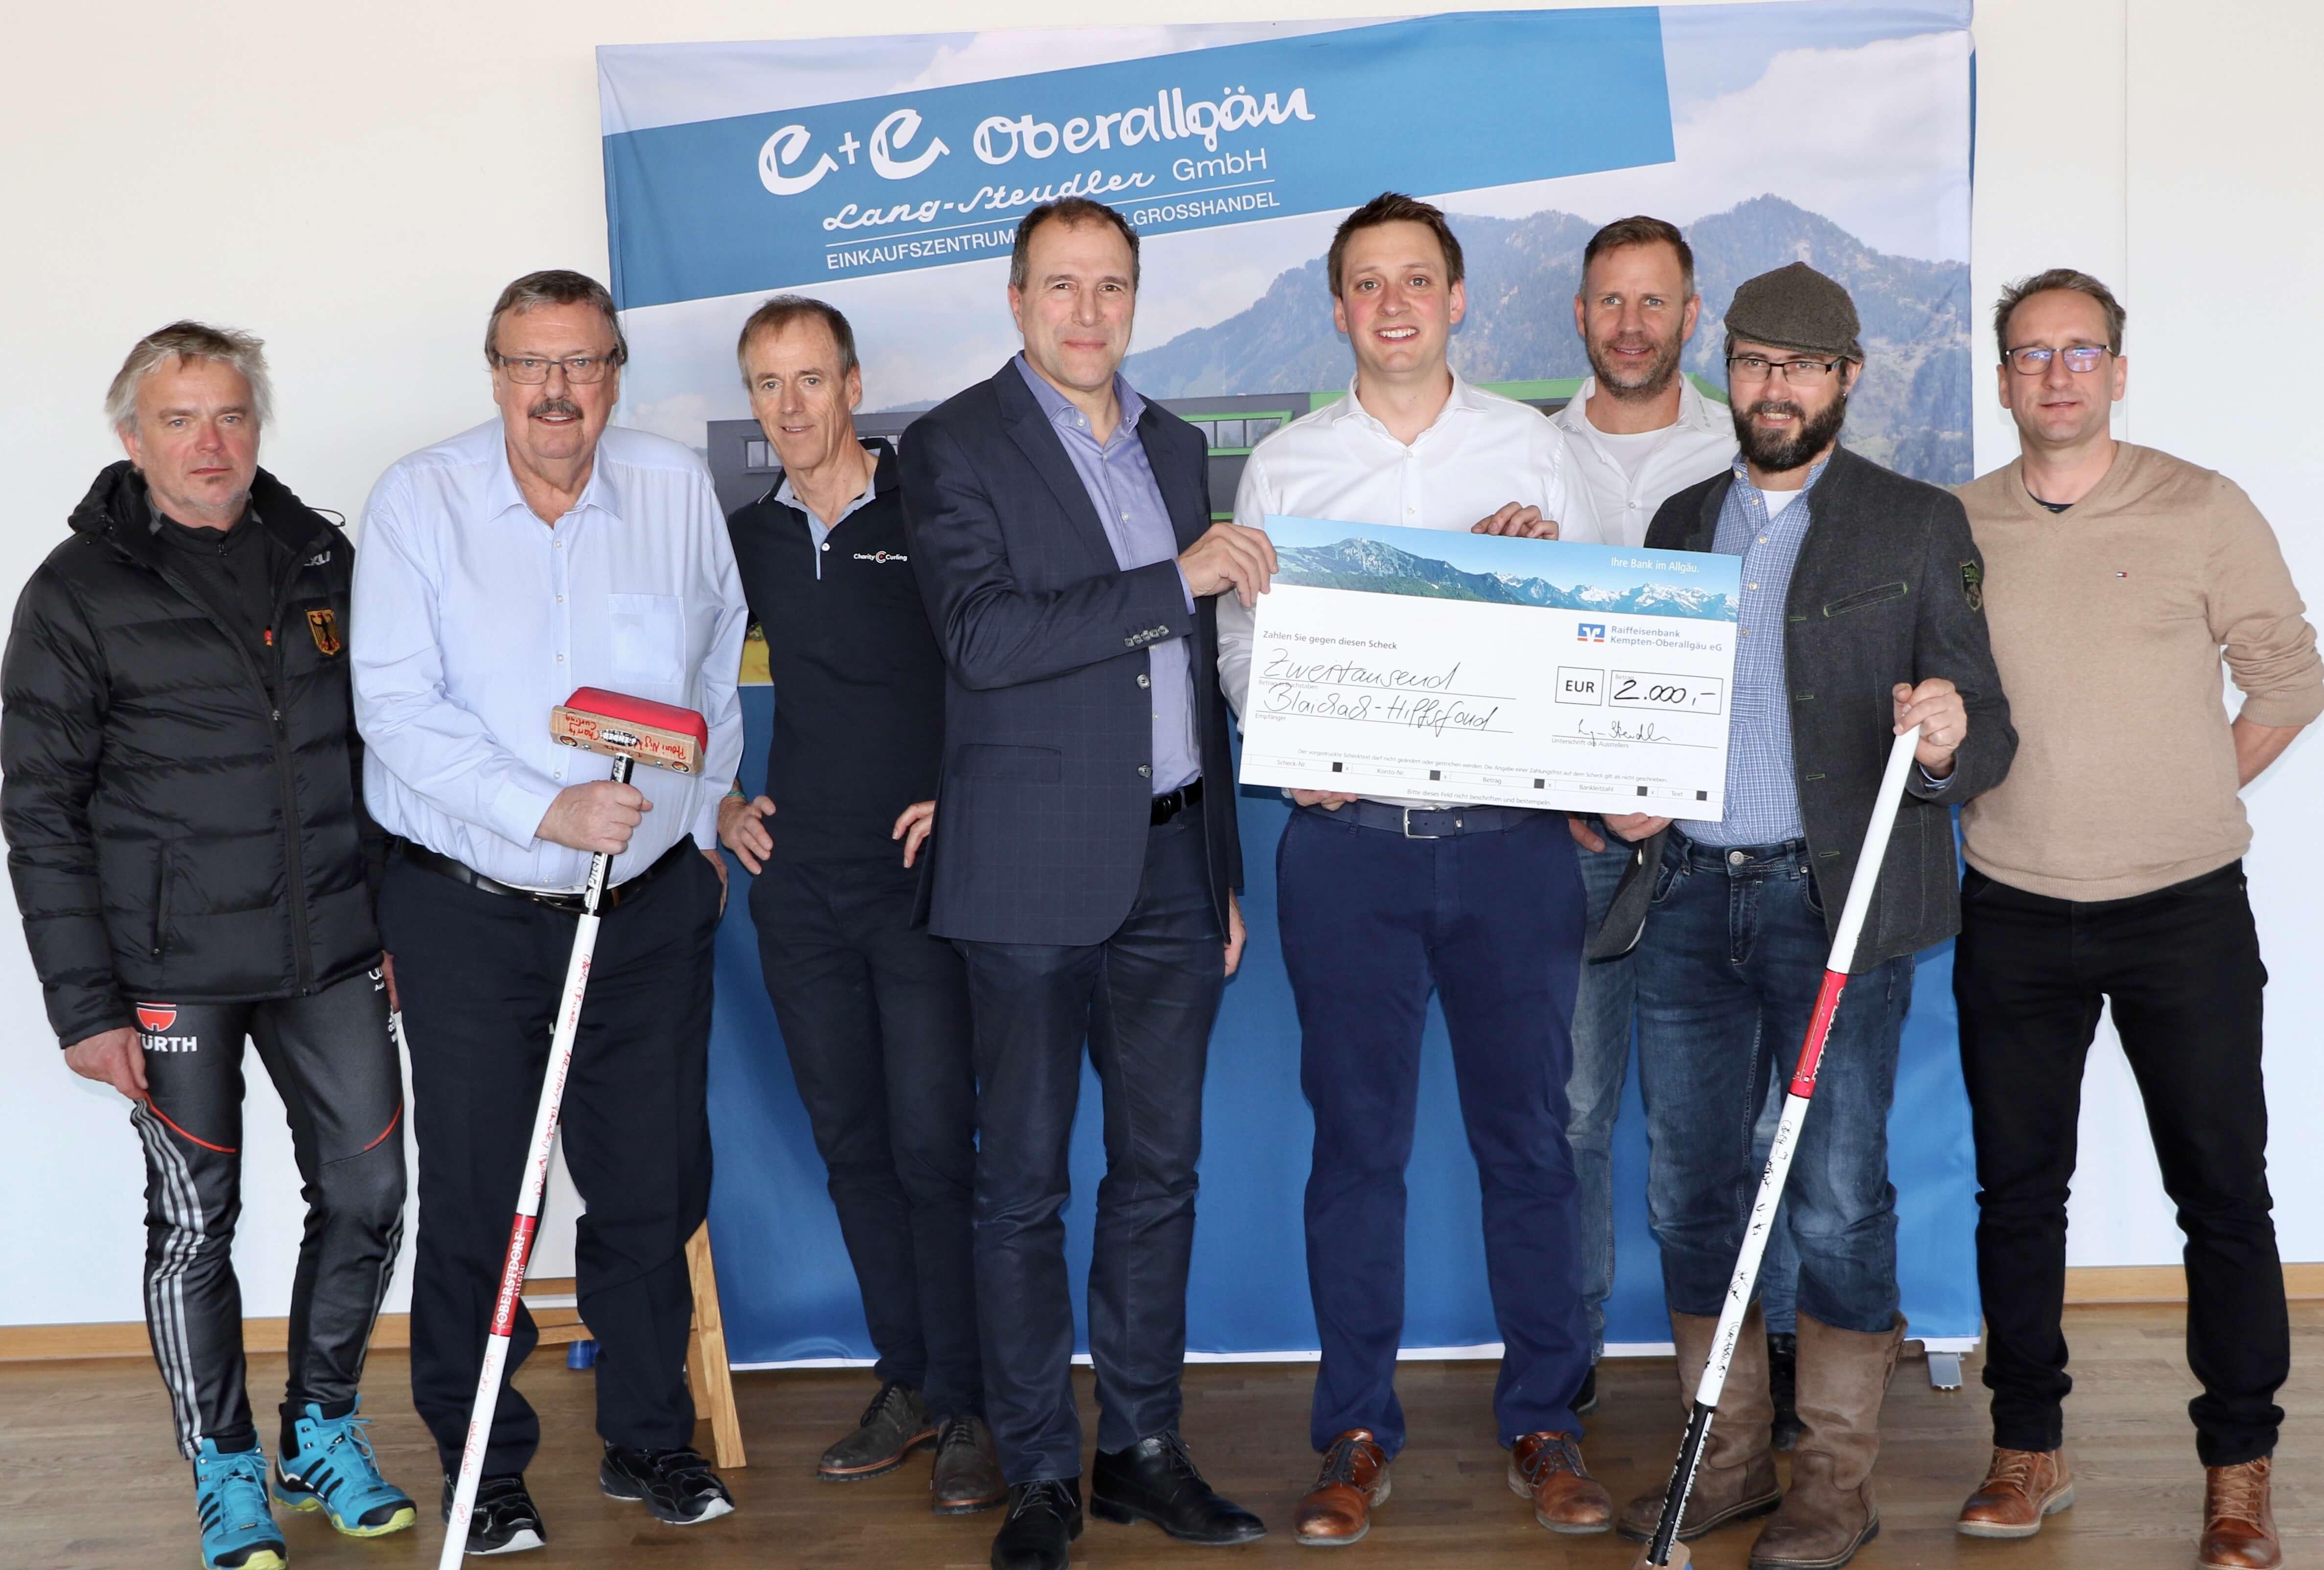 Team C+C Oberallgäu, Blaichach